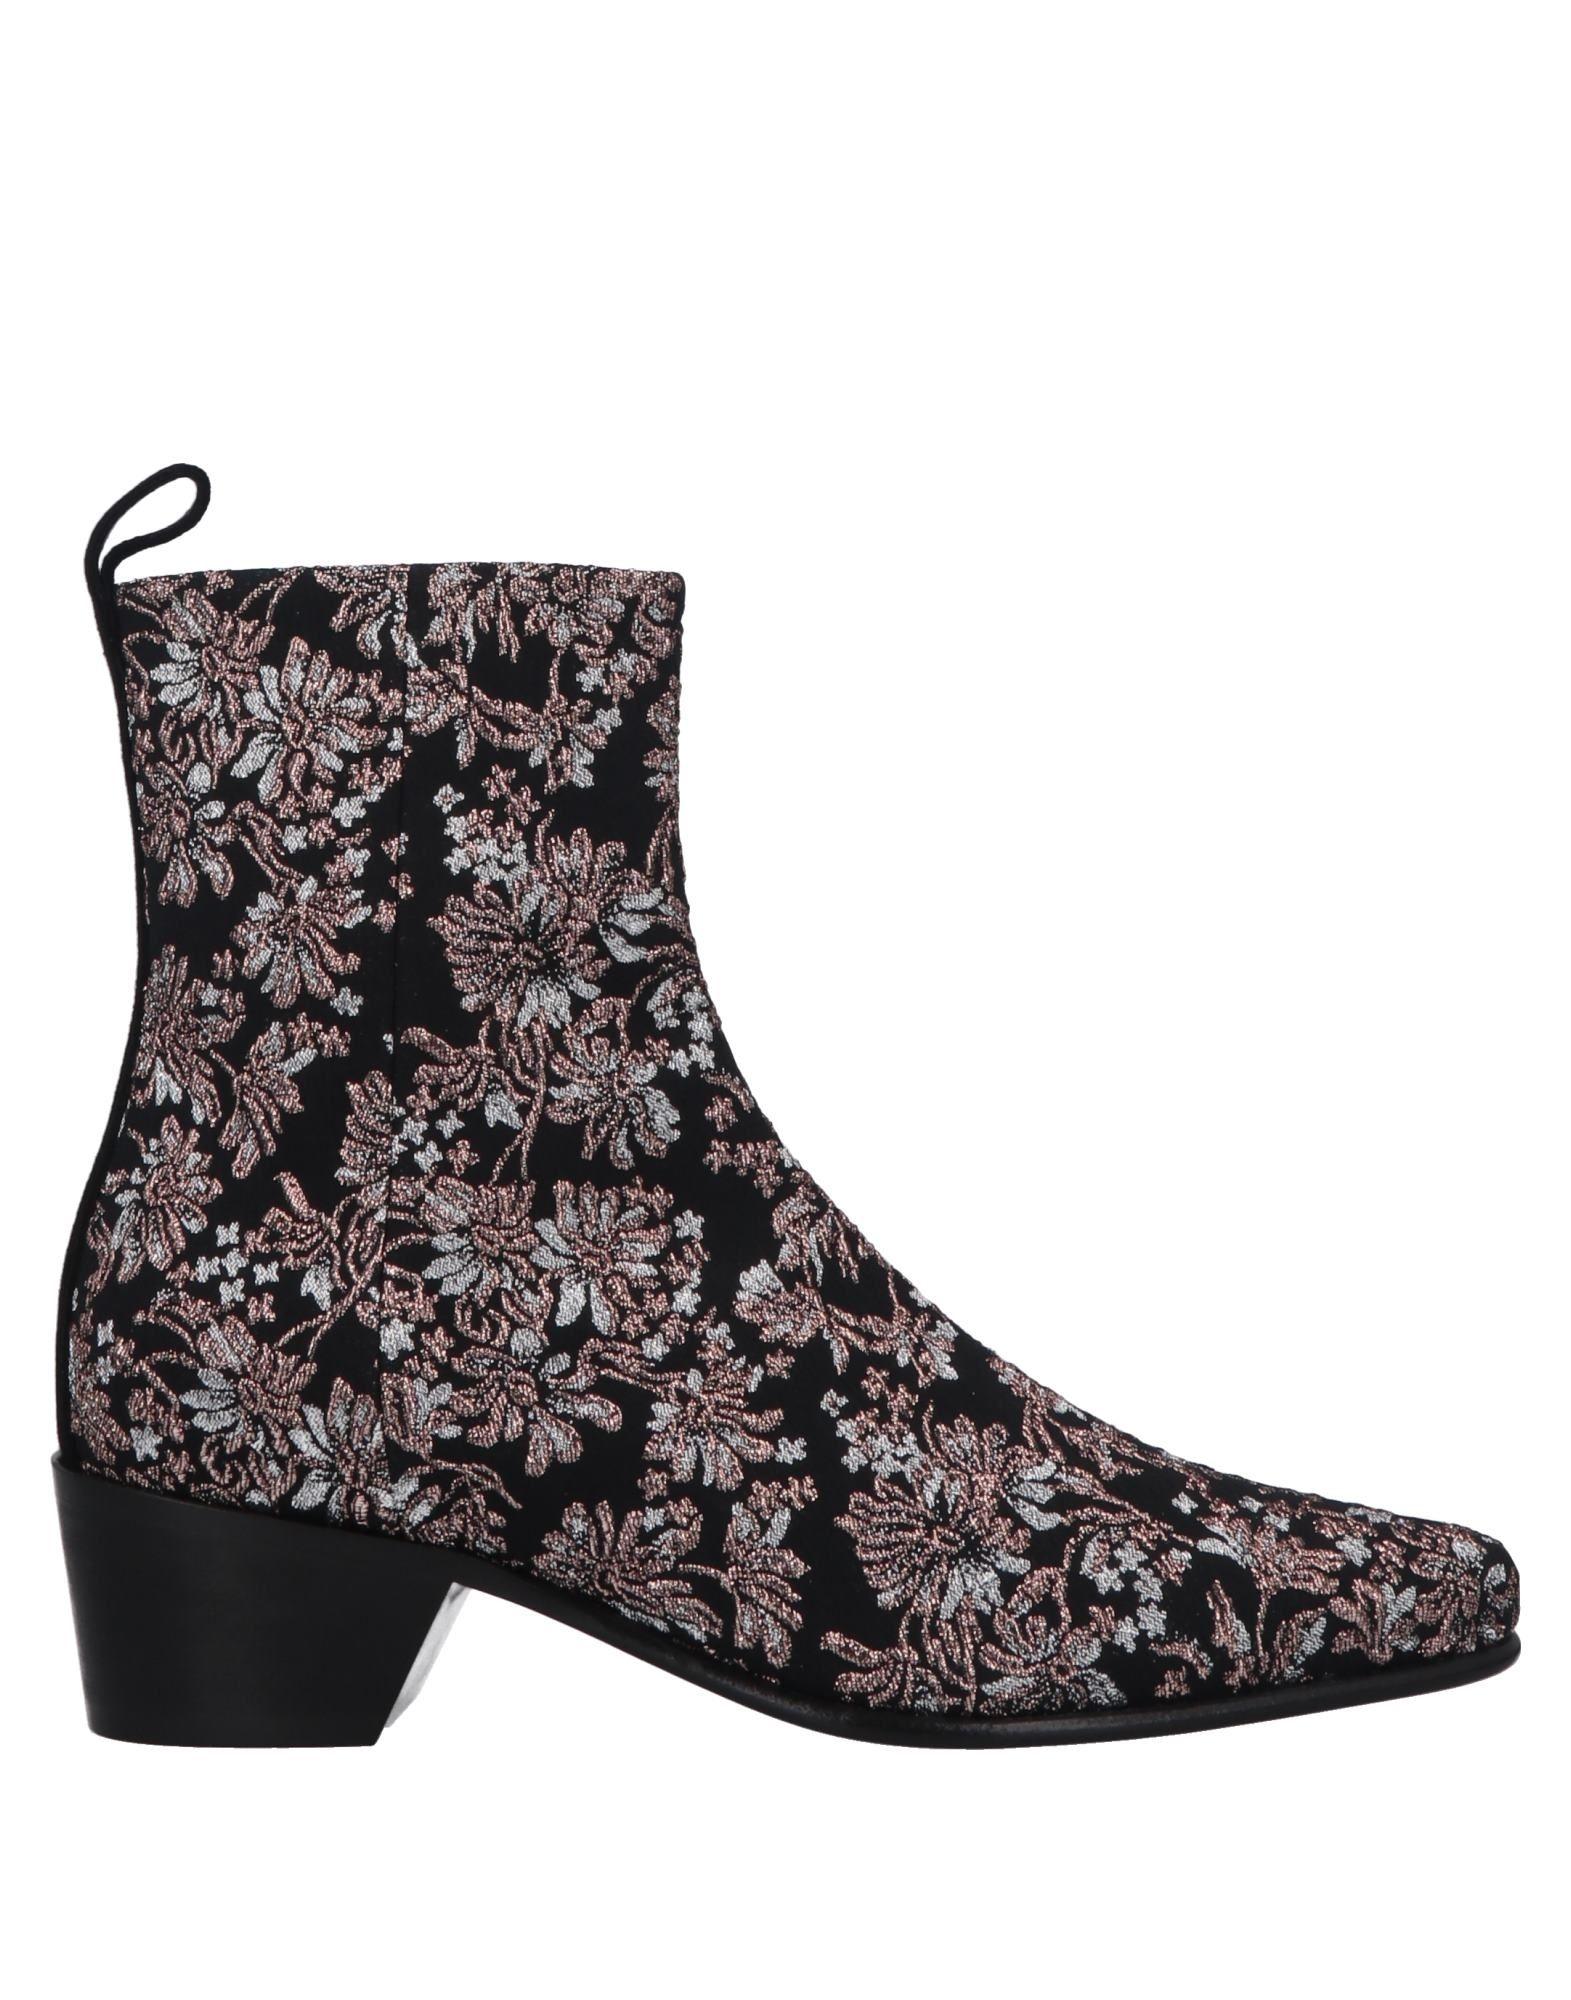 PIERRE HARDY Полусапоги и высокие ботинки pierre hardy полусапоги и высокие ботинки